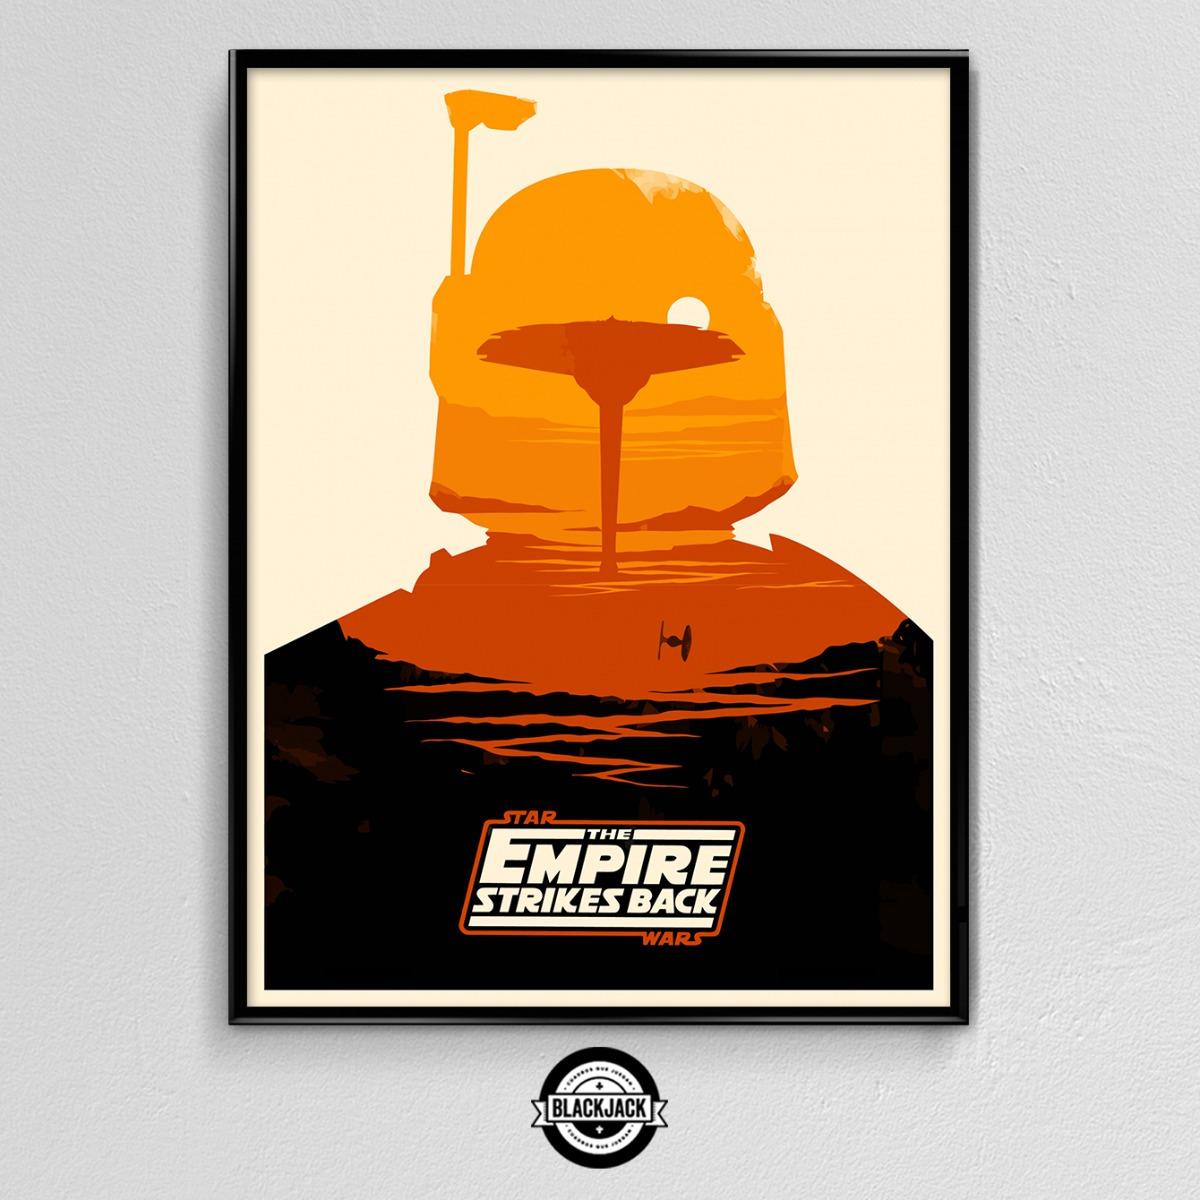 Cuadro 30x40 Marco Slim Star Wars Pelicula Deco Cine Retro - $ 450 ...